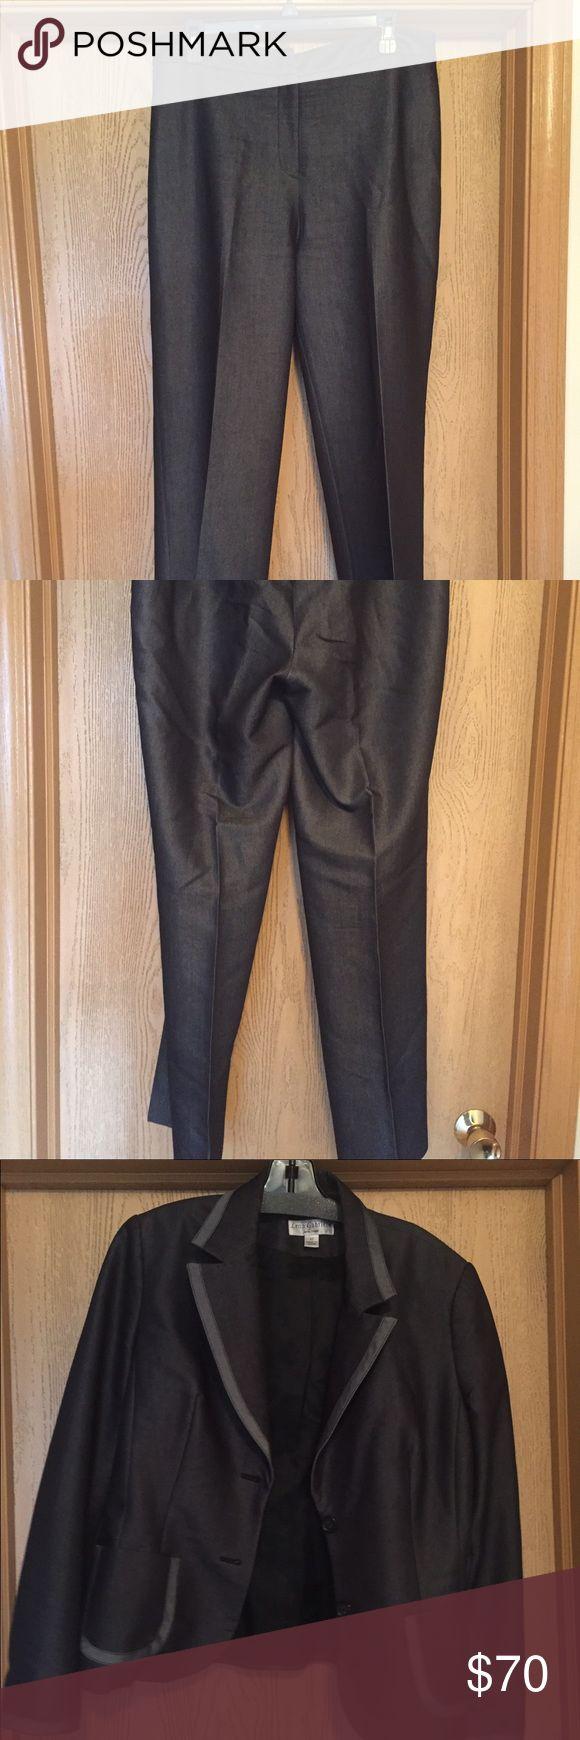 "Lena Gabrielle Pants Suit, Size 12 Dressy pants suit that has a denim look. The pants are 32"" and the suit is 62% viscose and 38% polyester. Lena Gabrielle Other"